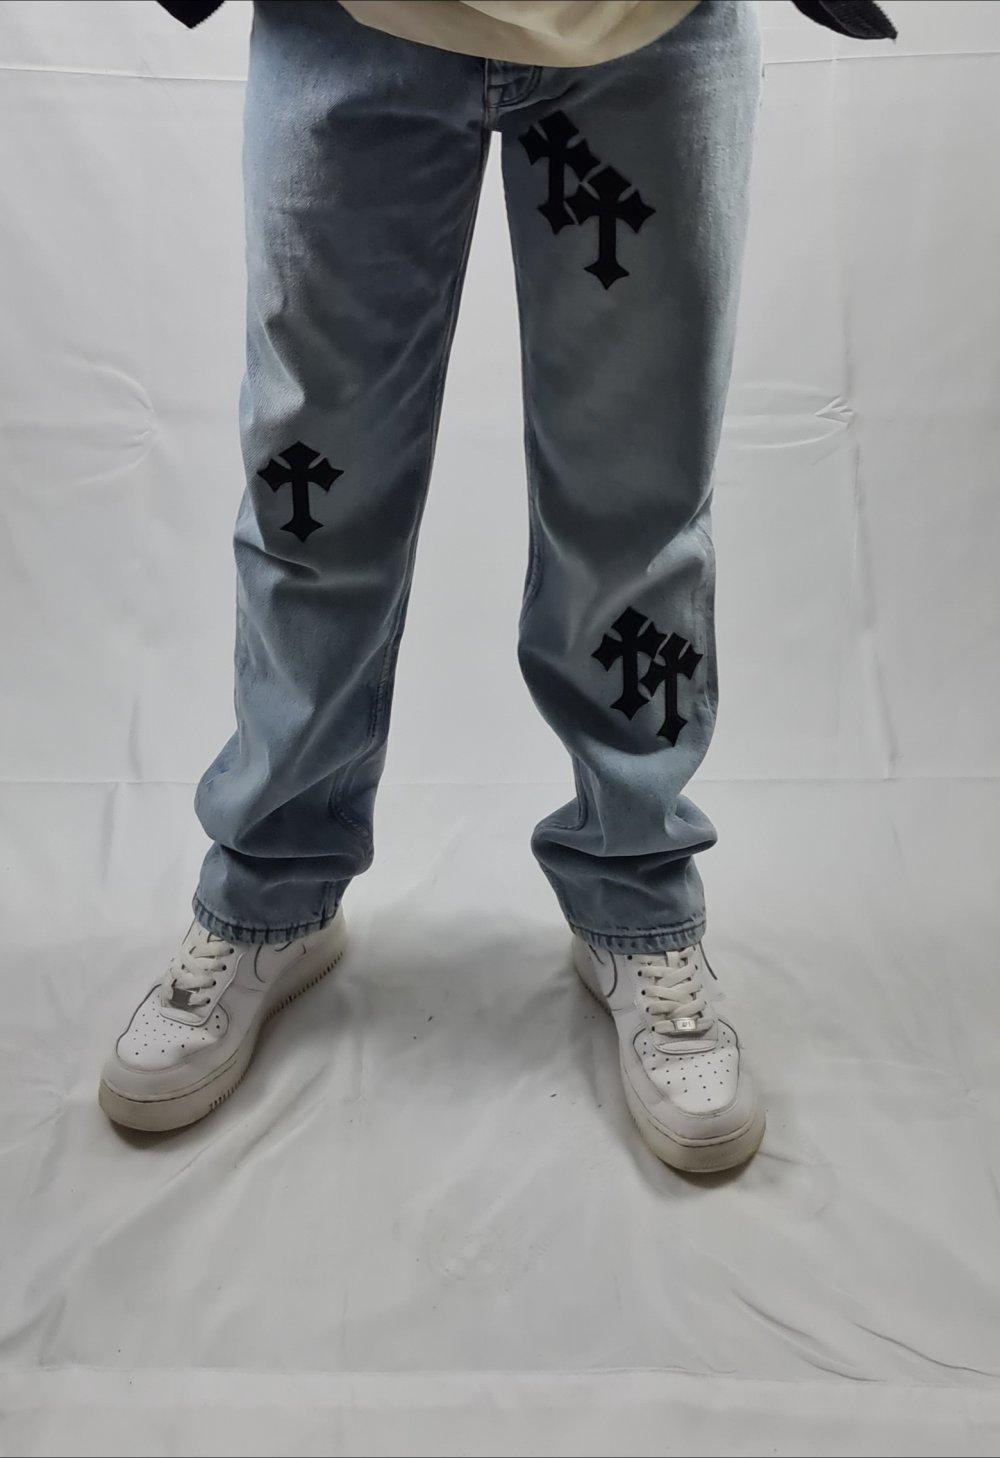 asos   Custom Chrome Hearts Jeans  Kleiderkorb.de